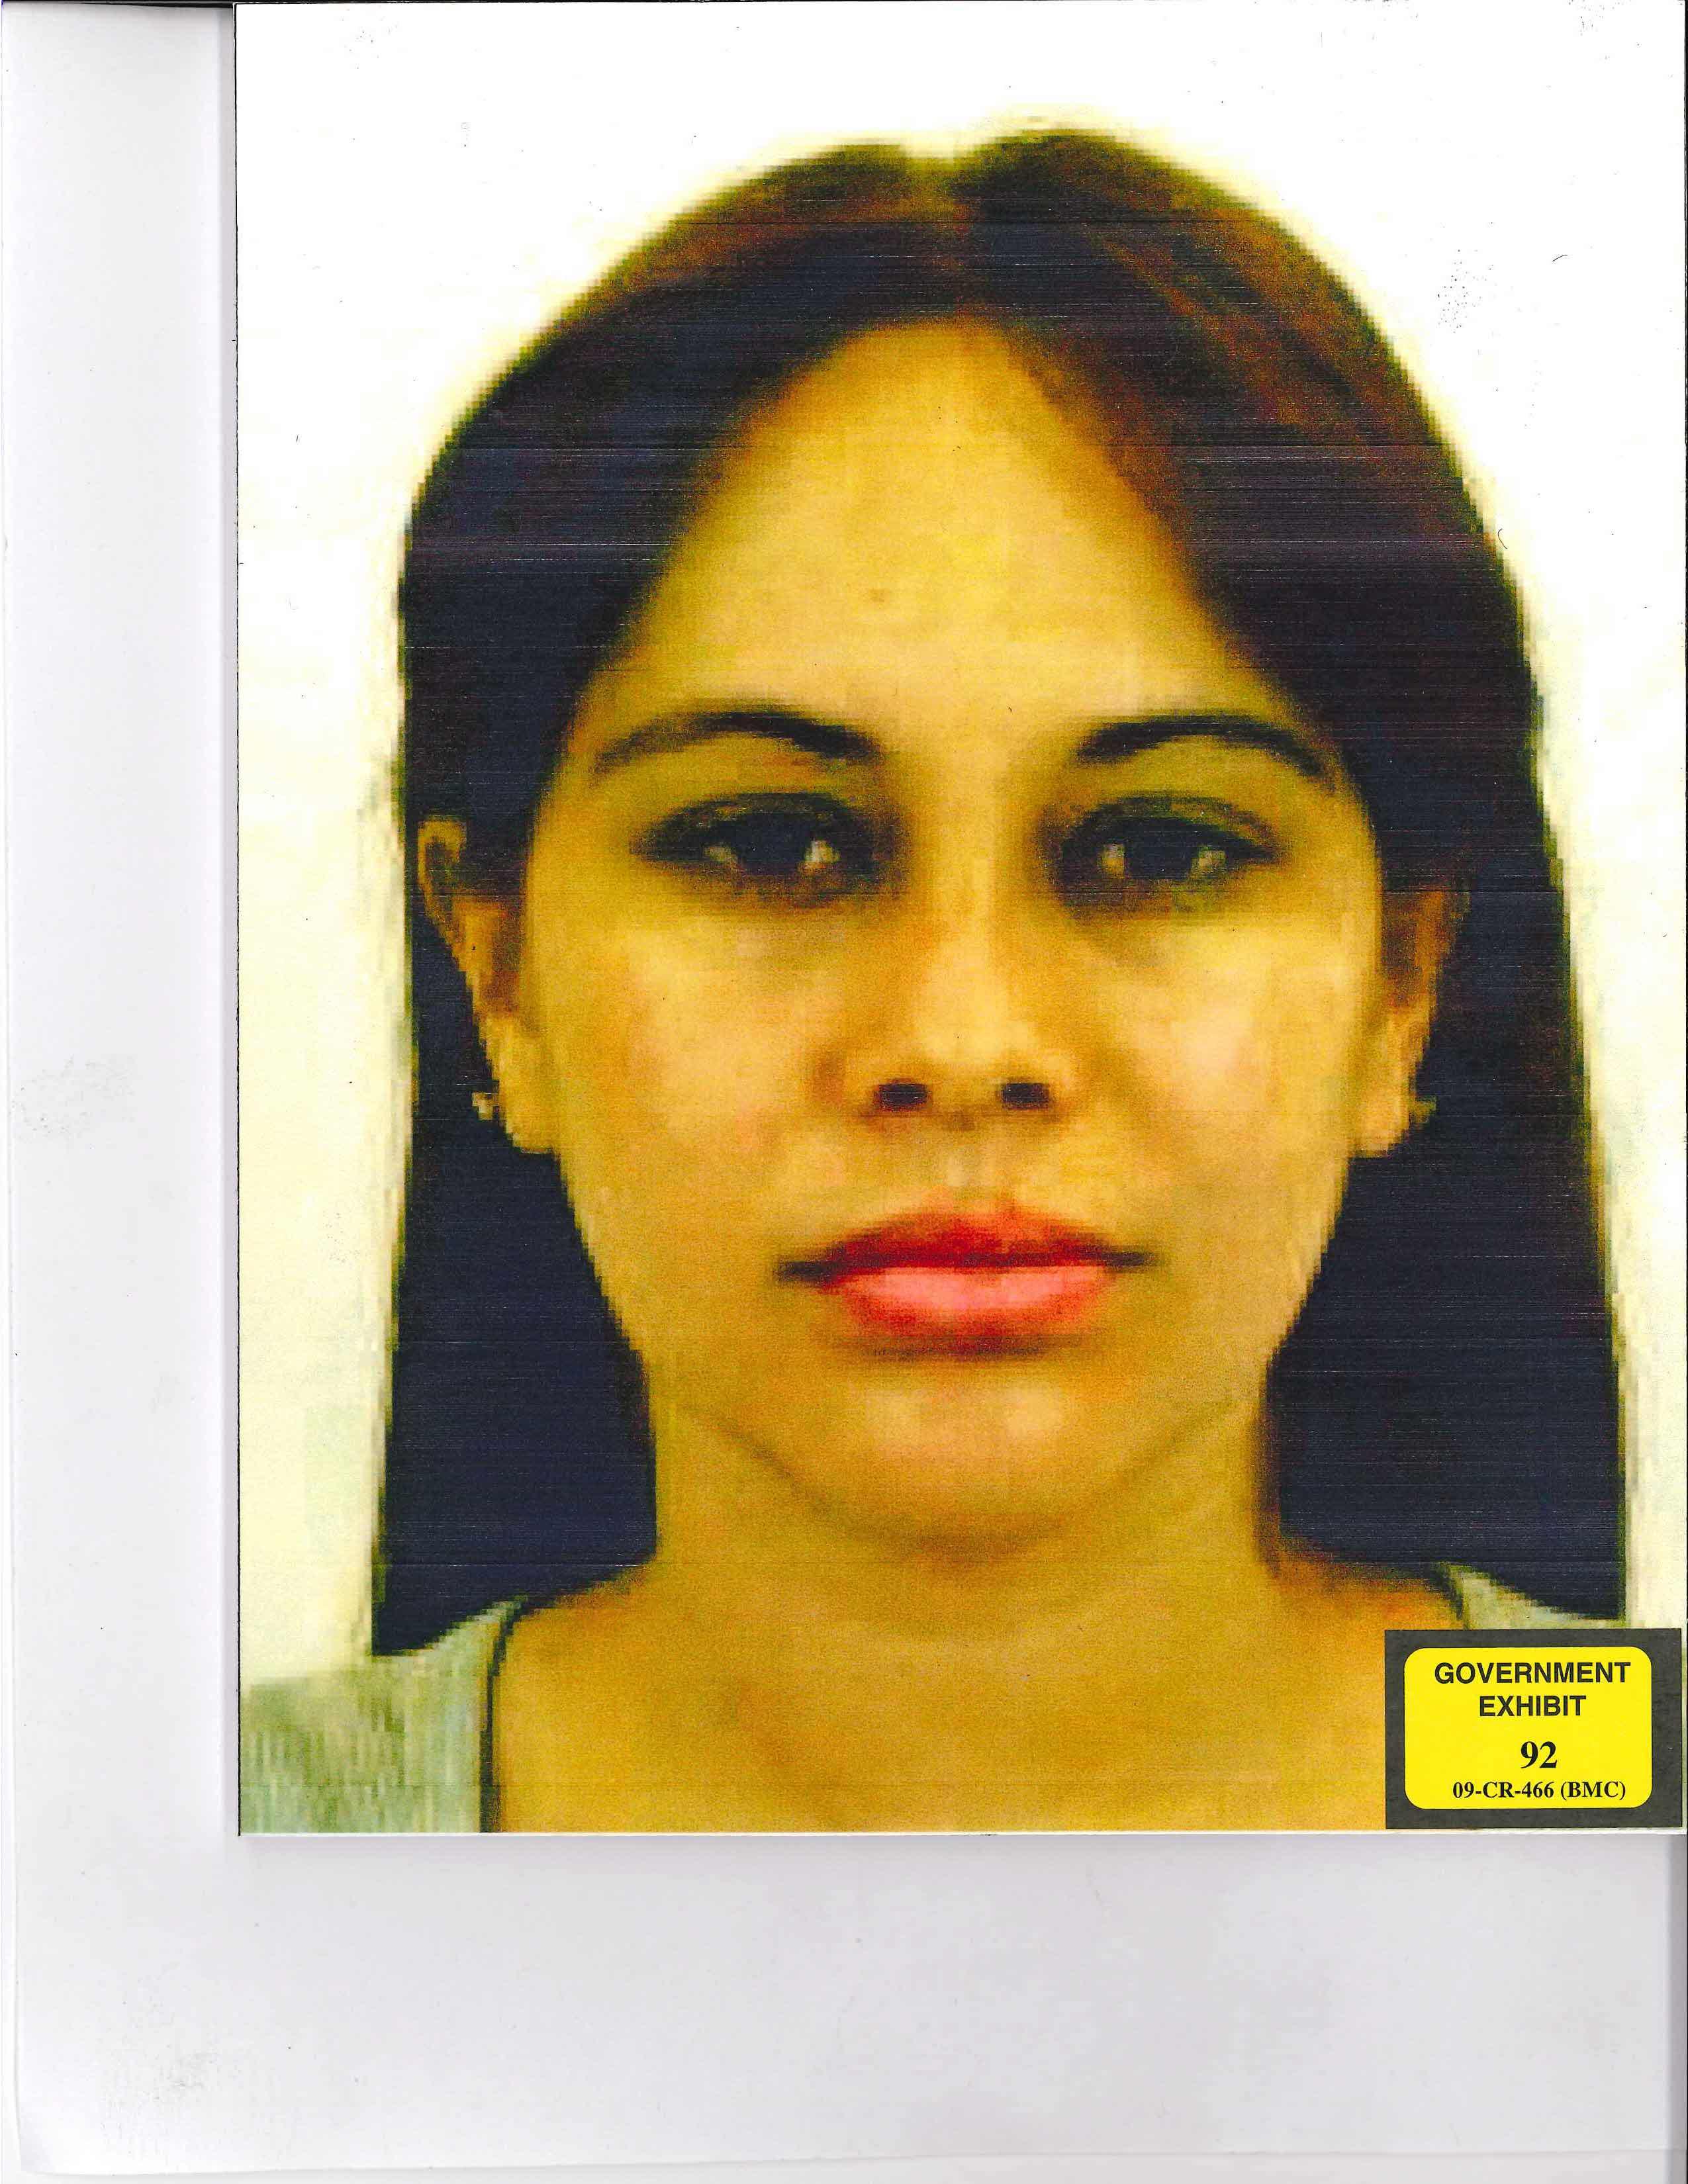 el chapo guzman u0026 39 s mistress bares alleged drug crime secrets